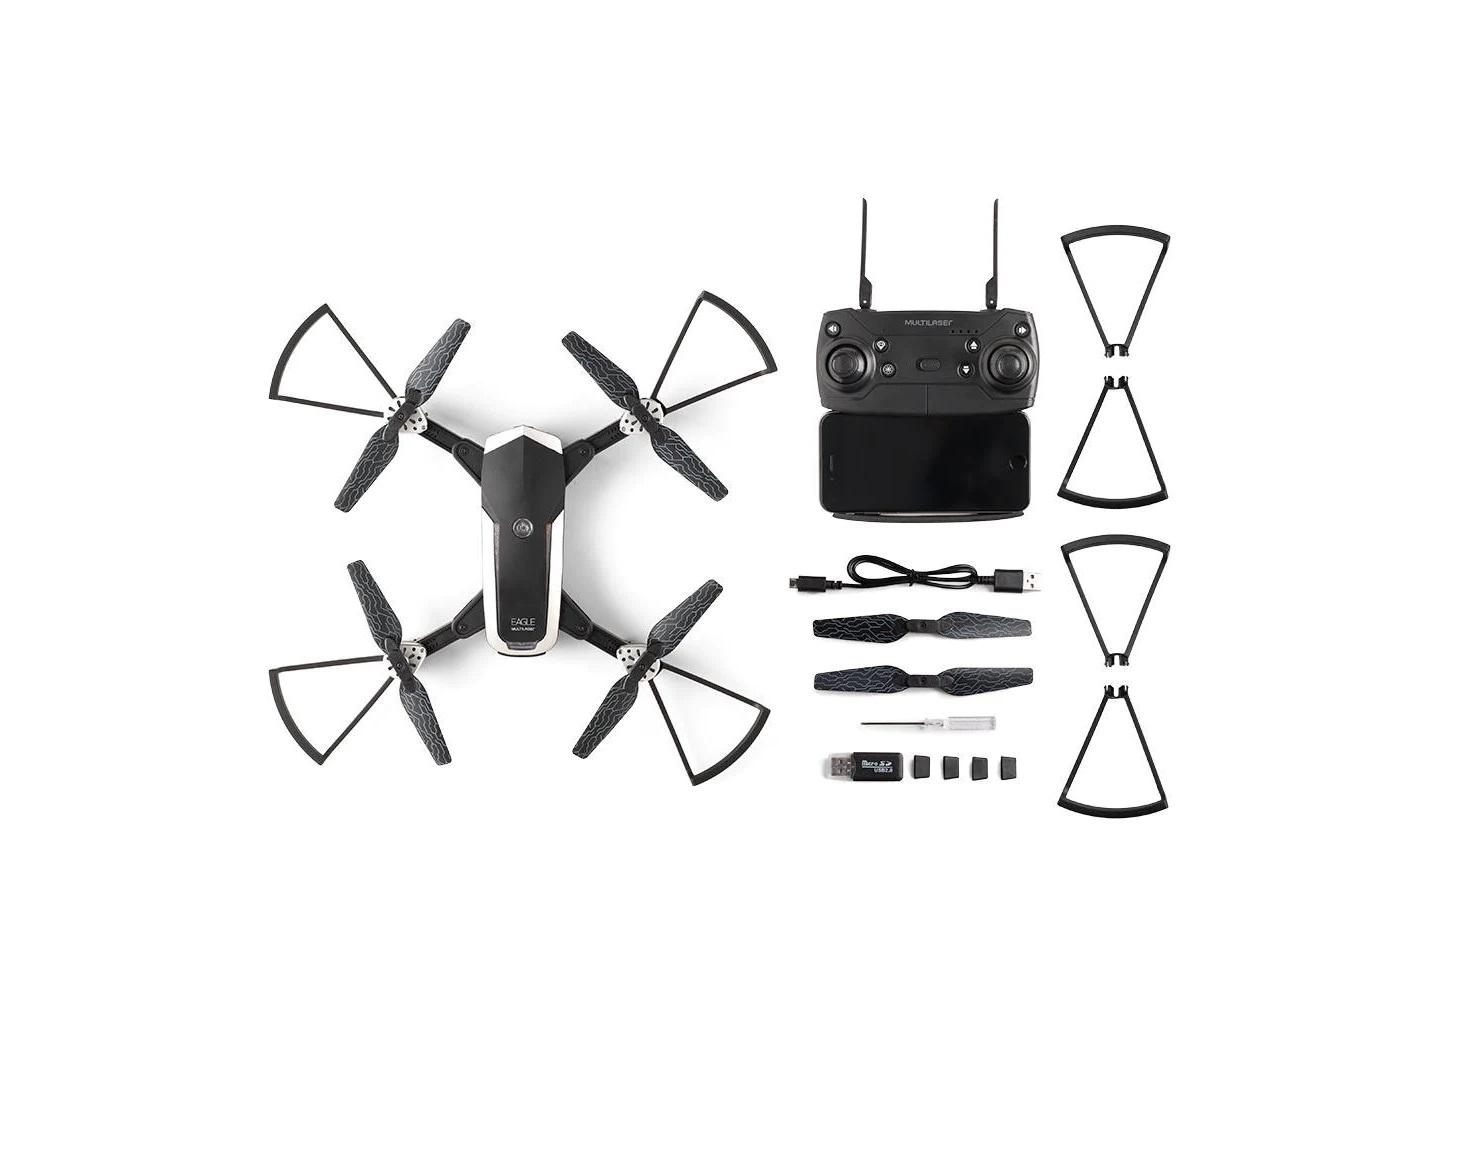 DRONE EAGLE COM CÂMERA HD FPV ALCANCE 80 METROS MULTILASER - ES256  - Mix Eletro